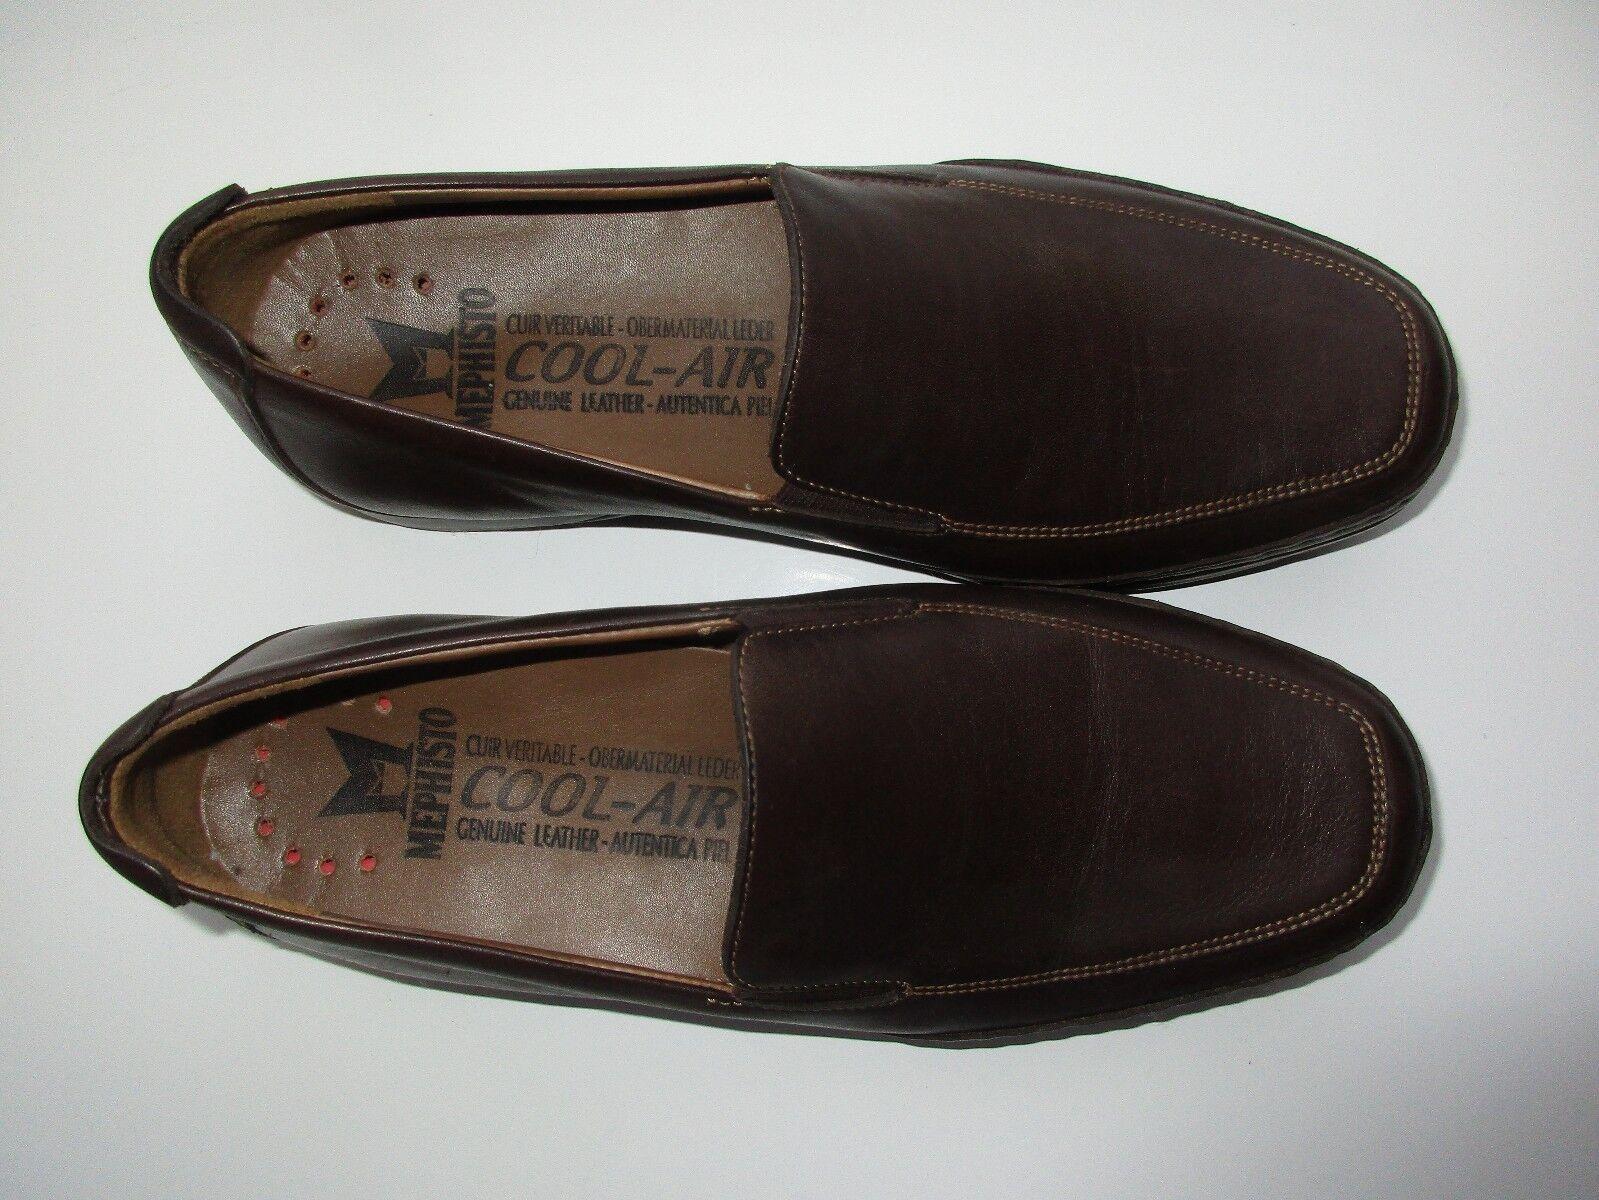 Mephisto 13141414205 Edlef Slip-On Men loafers Toast 7.5M (or 8M) MSRP